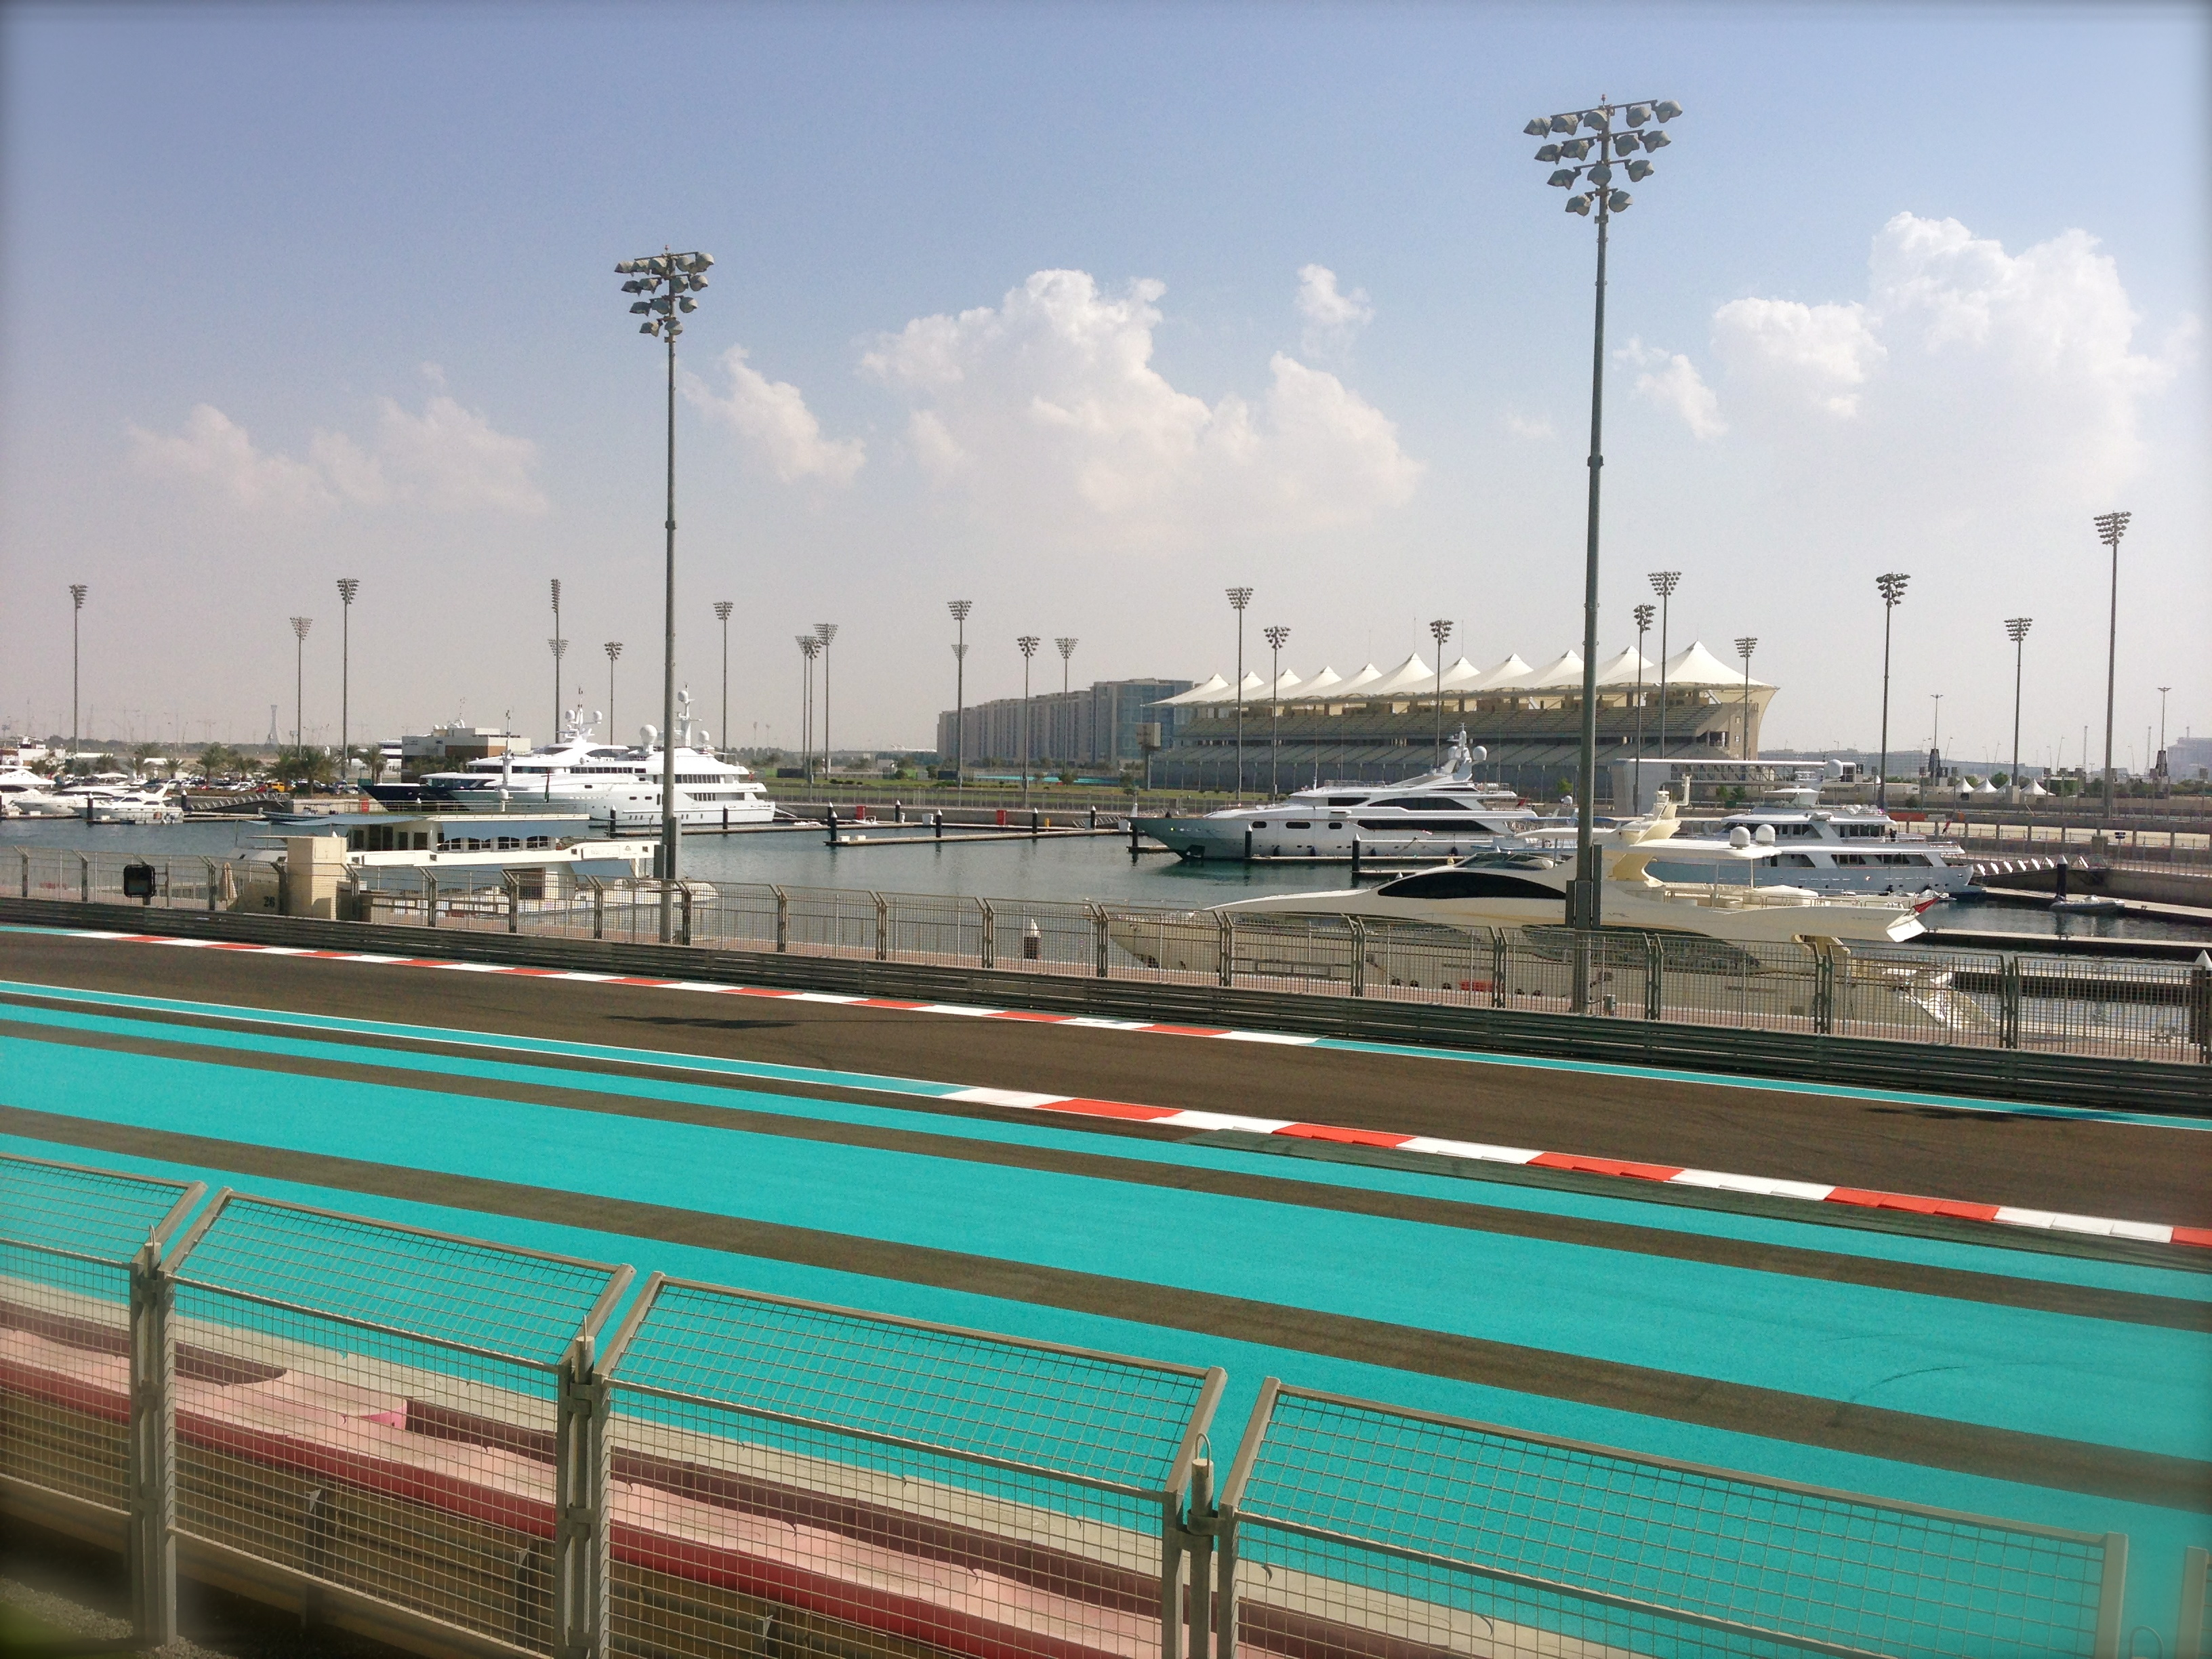 F1 racetrack Abu Dhabi